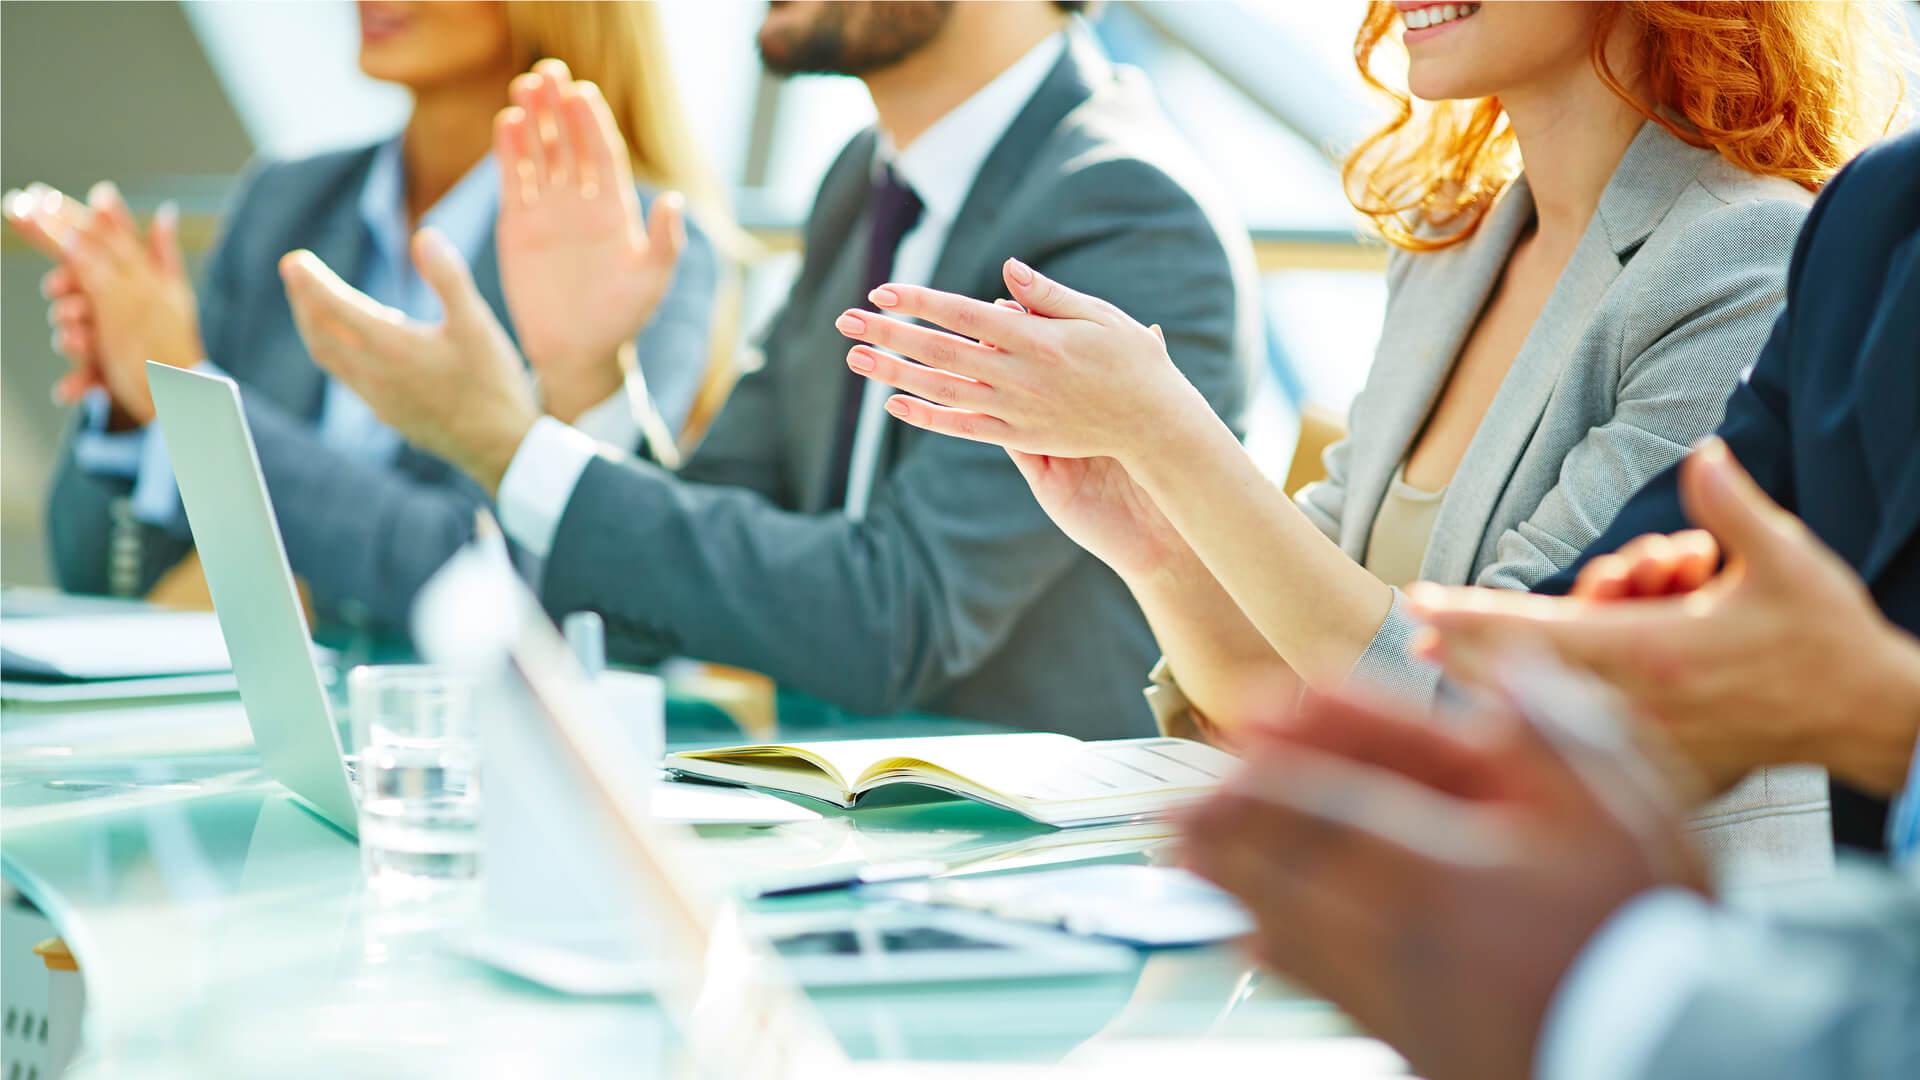 consumer-insights,-presentation-tips:-thursday's-daily-brief